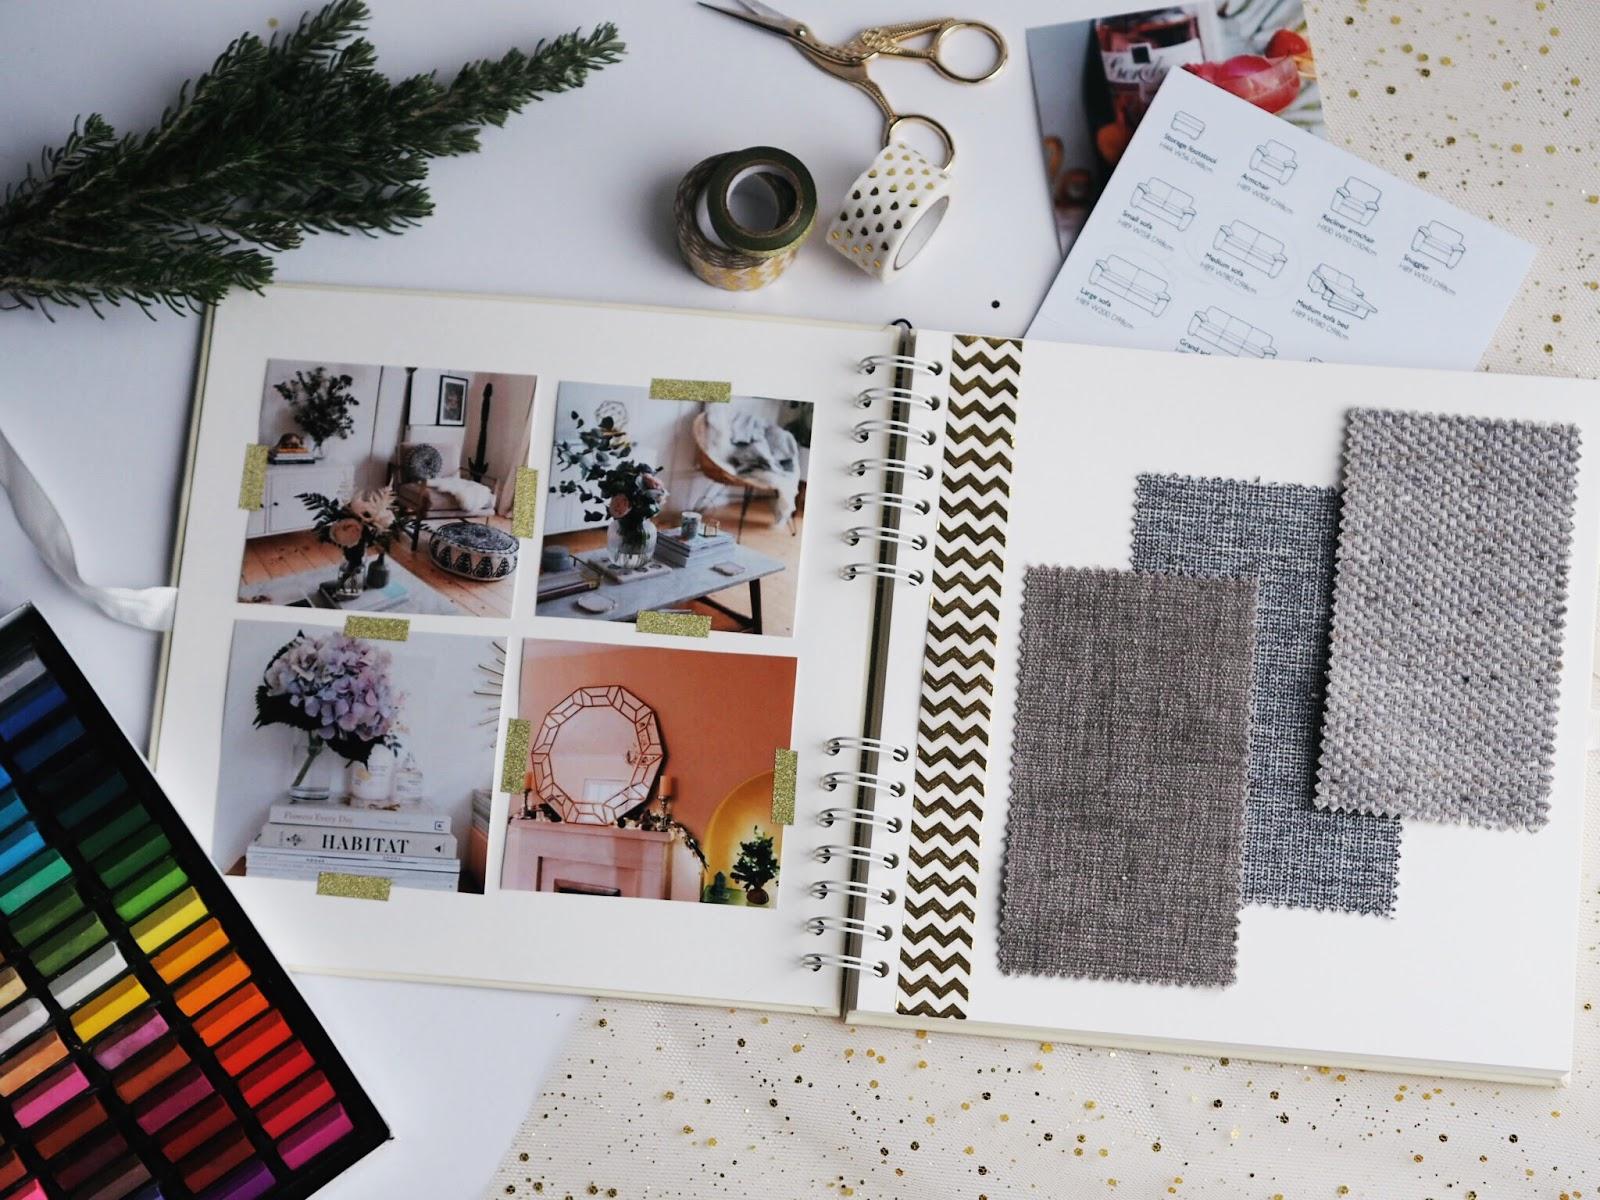 First Home Planning Living Room Scrapbook Flatlay Pastels Washi Tape Crane Scissors